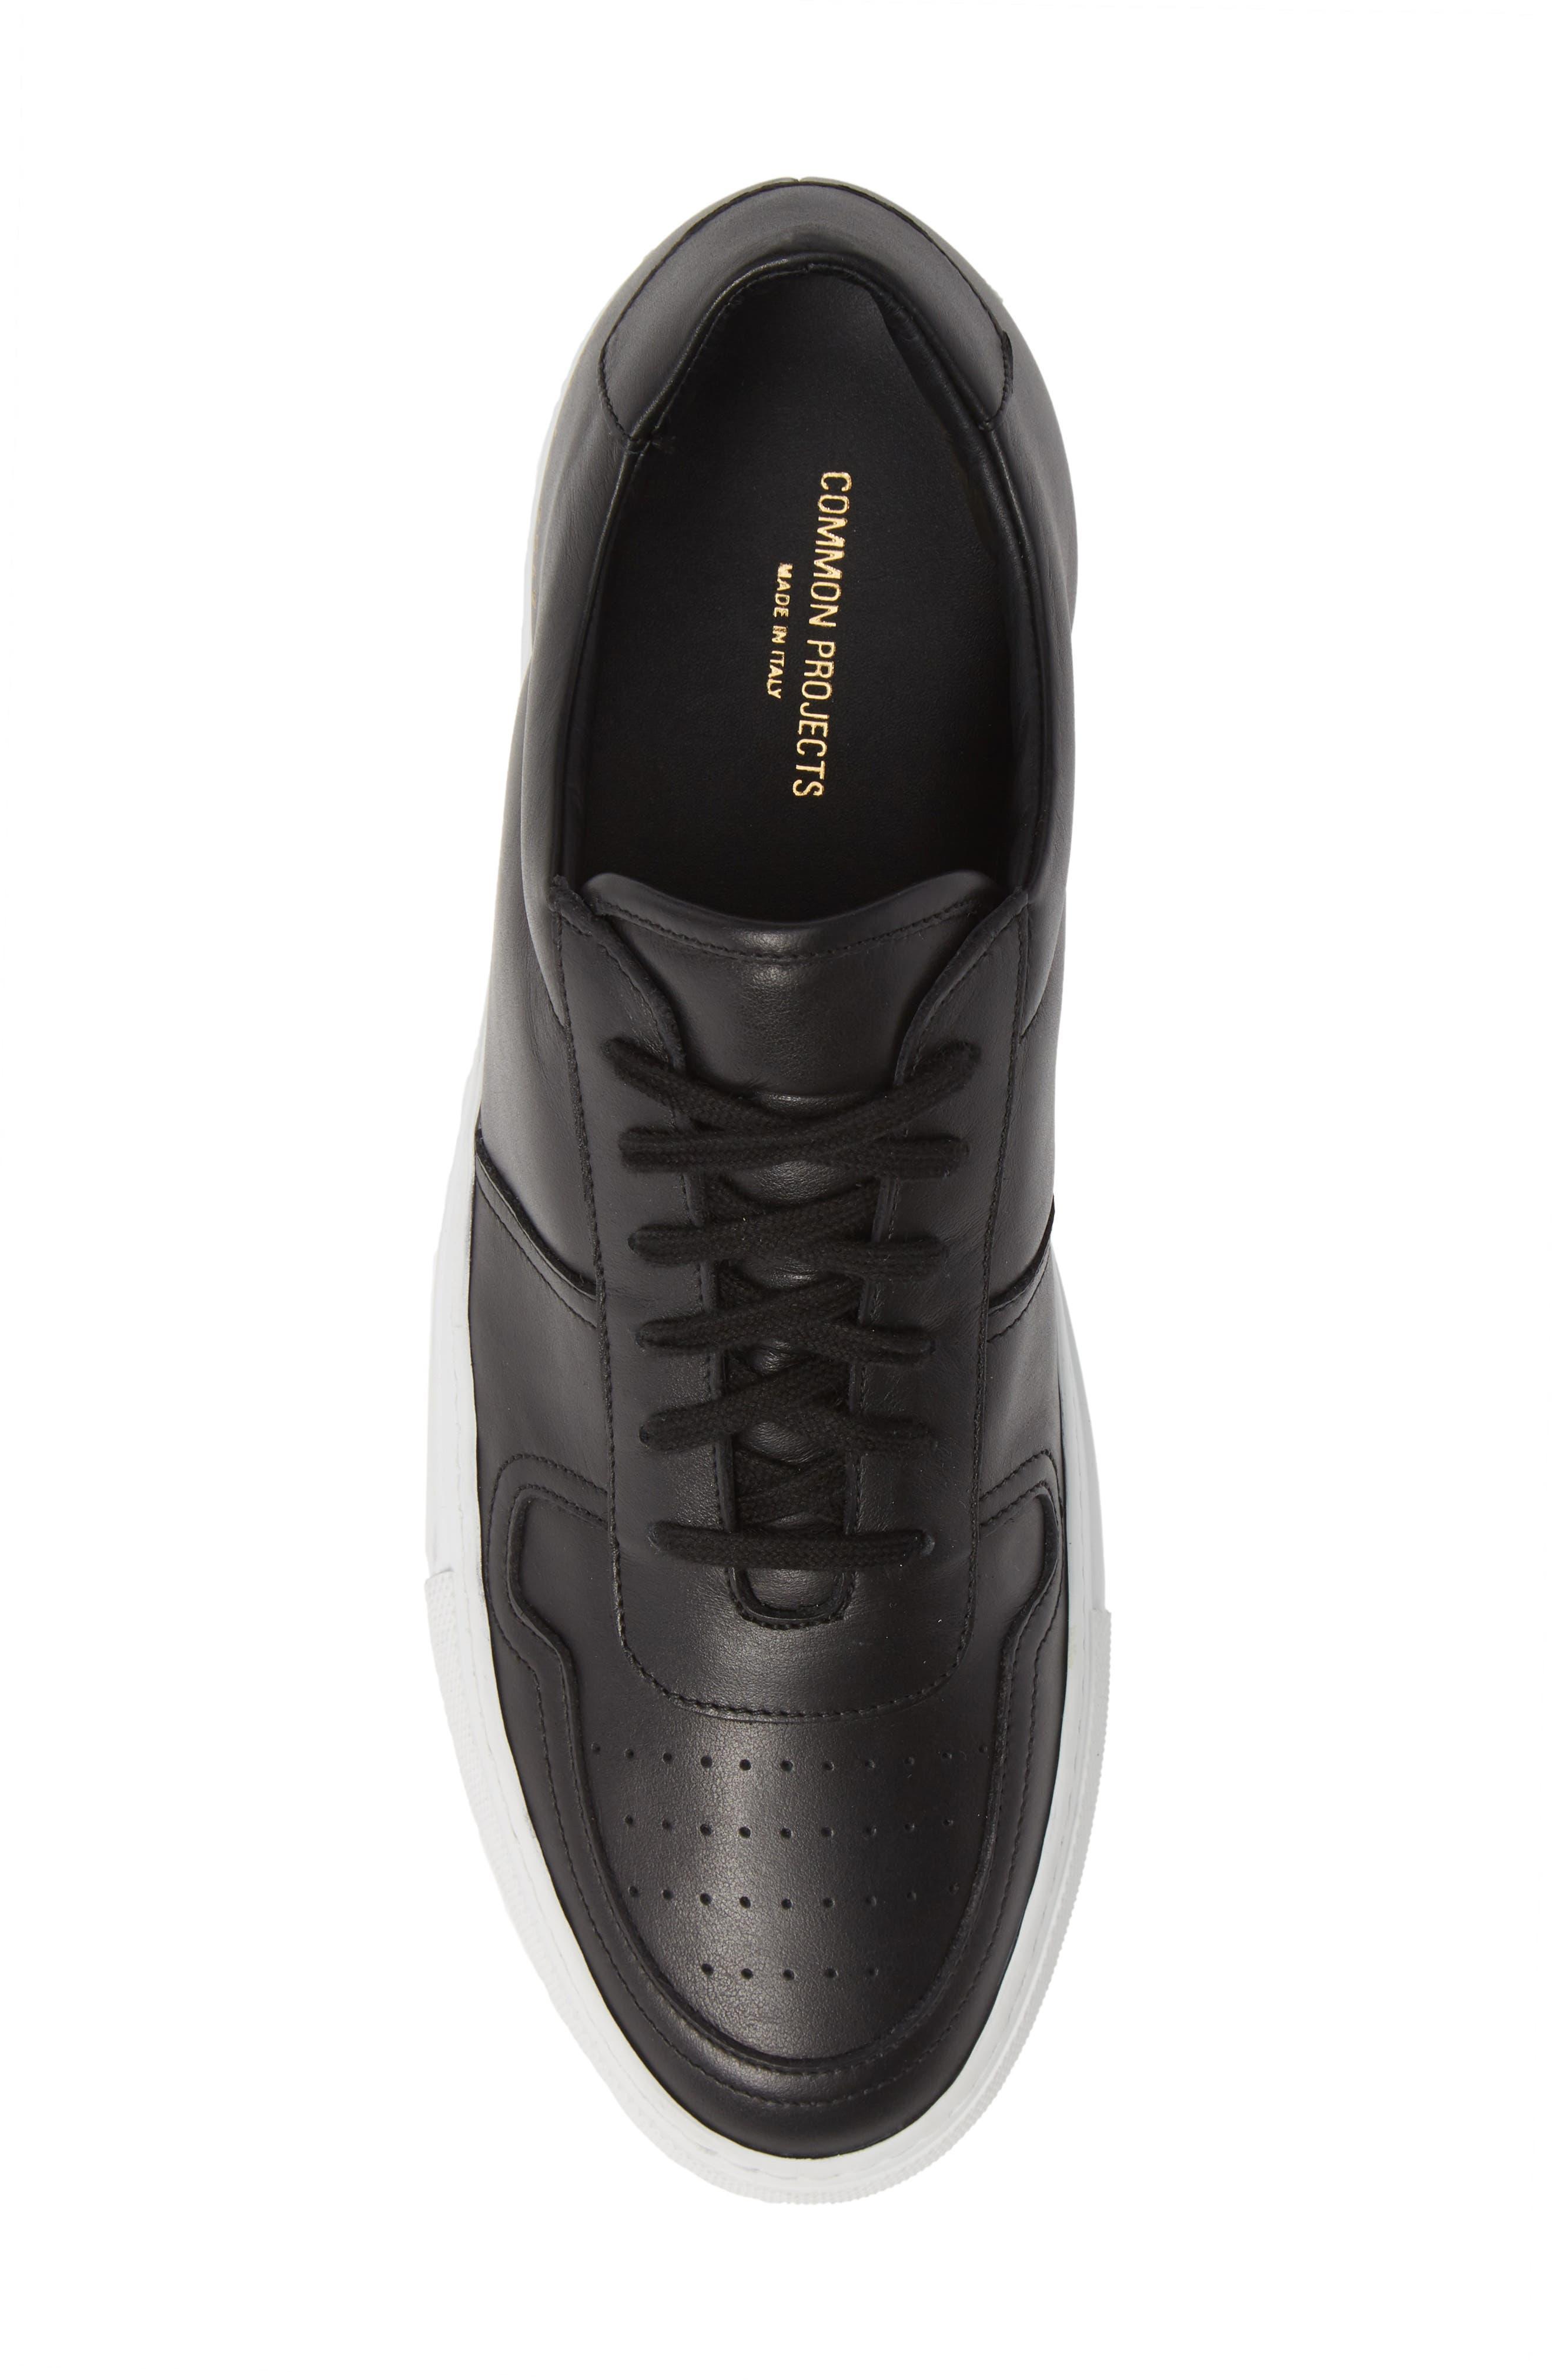 Bball Low Top Sneaker,                             Alternate thumbnail 5, color,                             BLACK